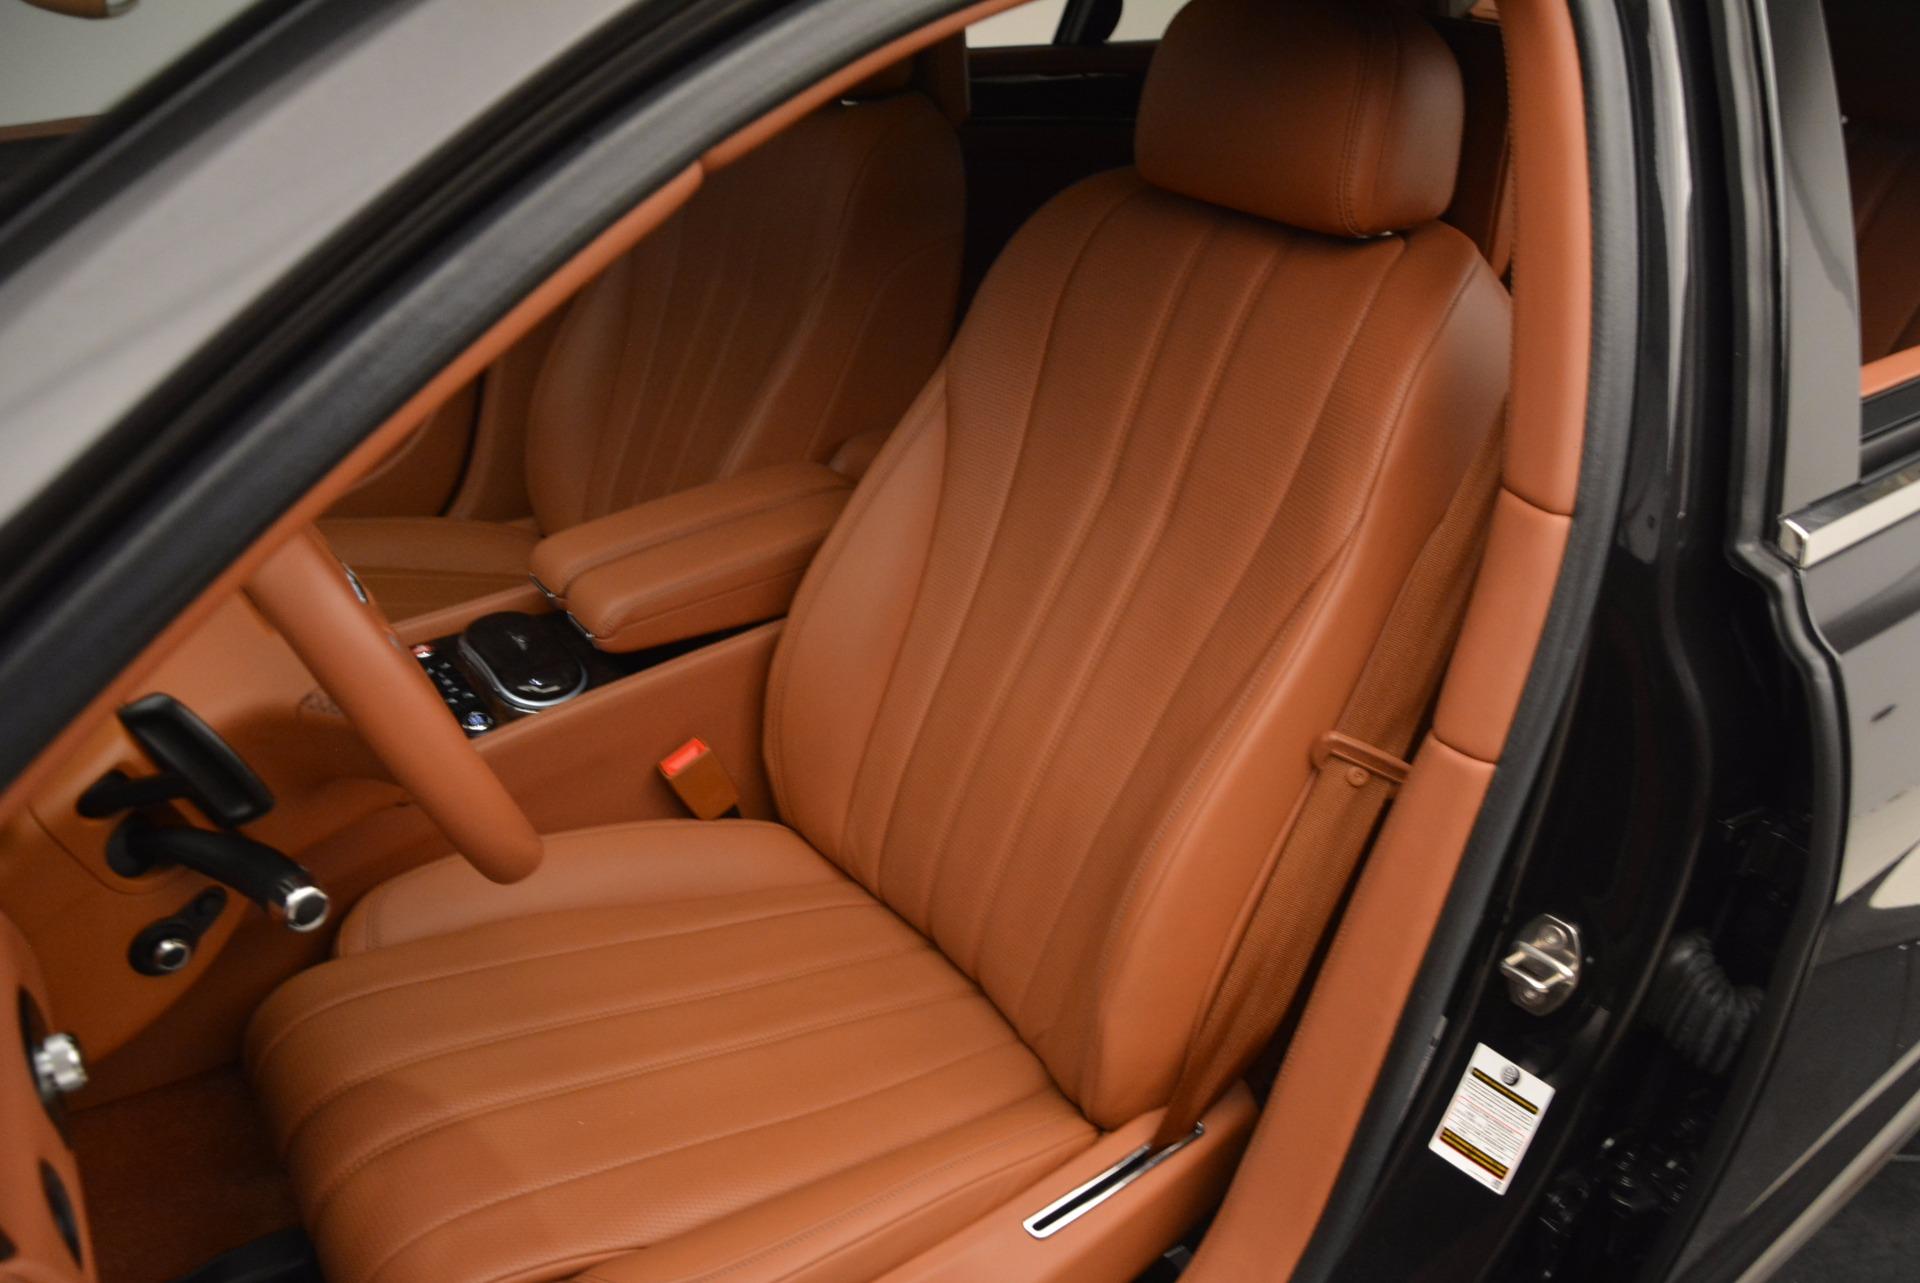 Used 2014 Bentley Flying Spur W12 For Sale In Westport, CT 1598_p28